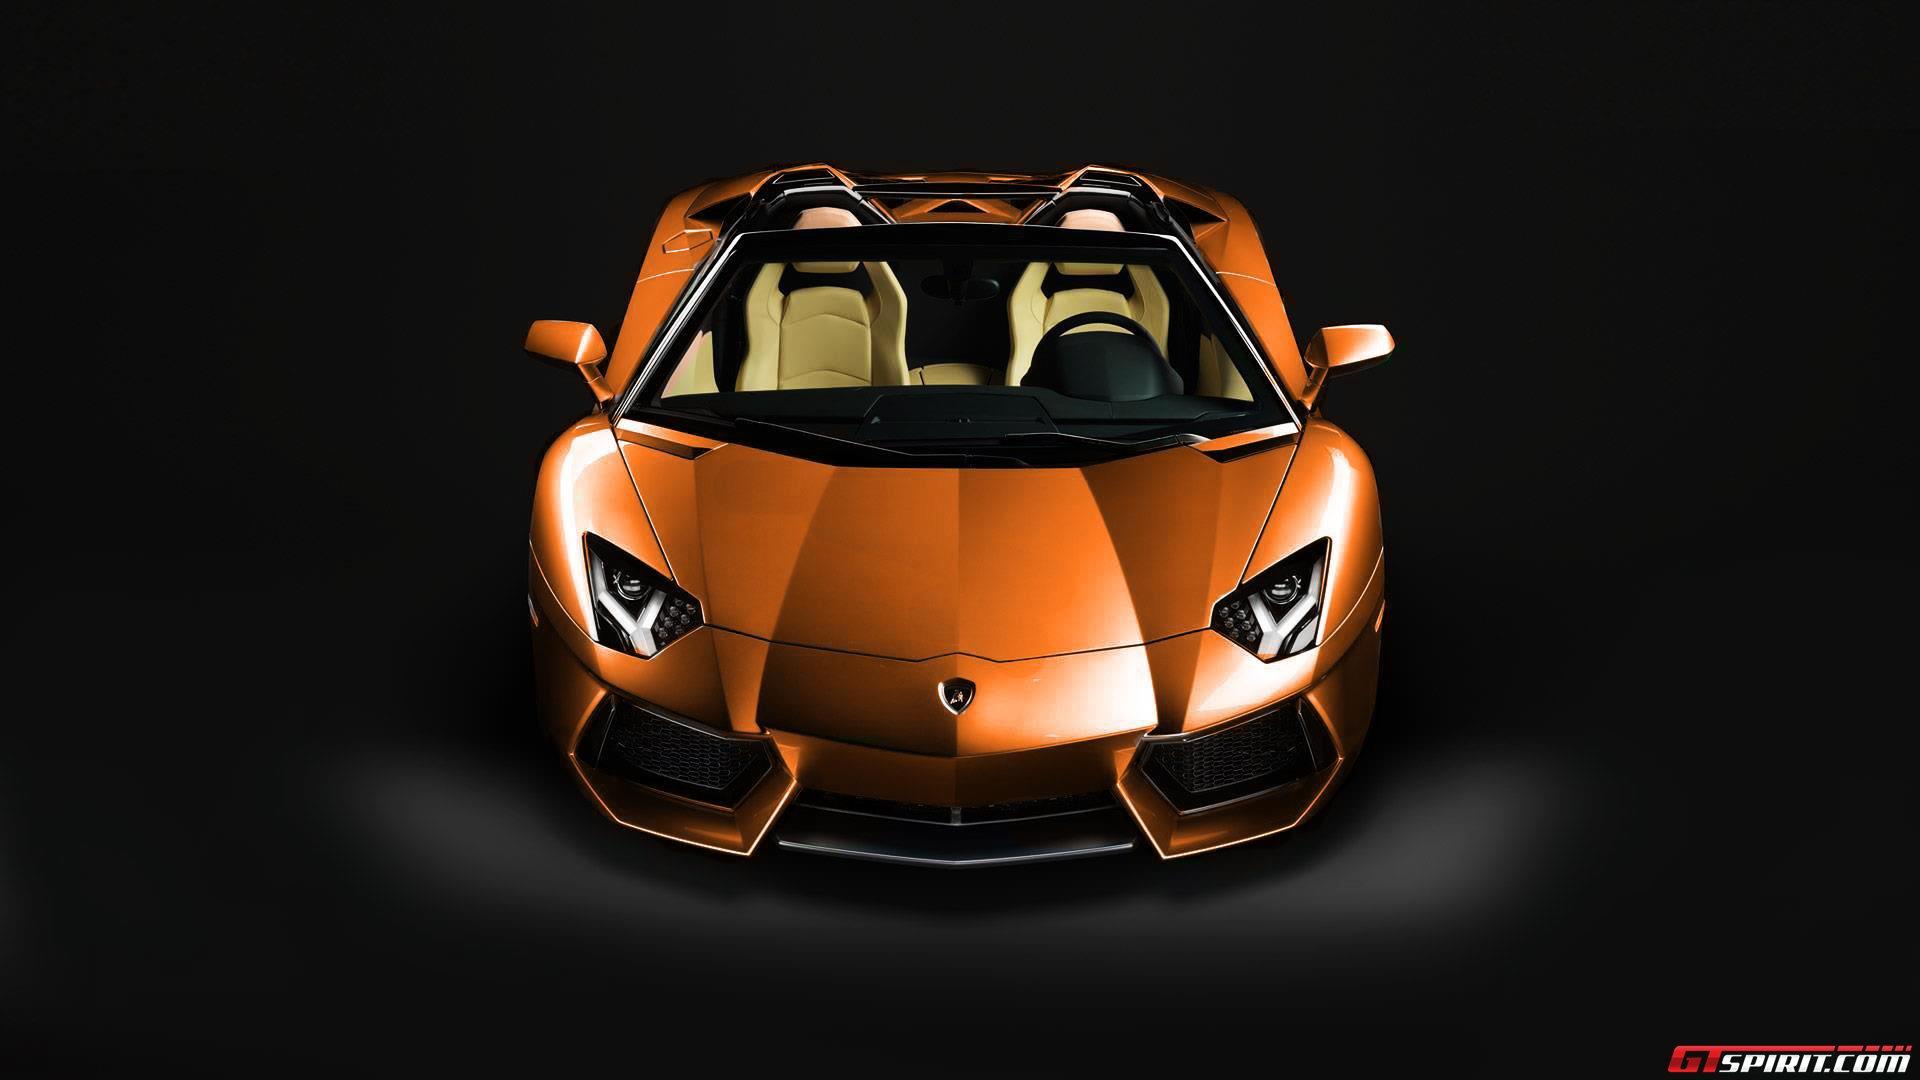 2013 Lamborghini Aventador Roadster Colors Photo 10